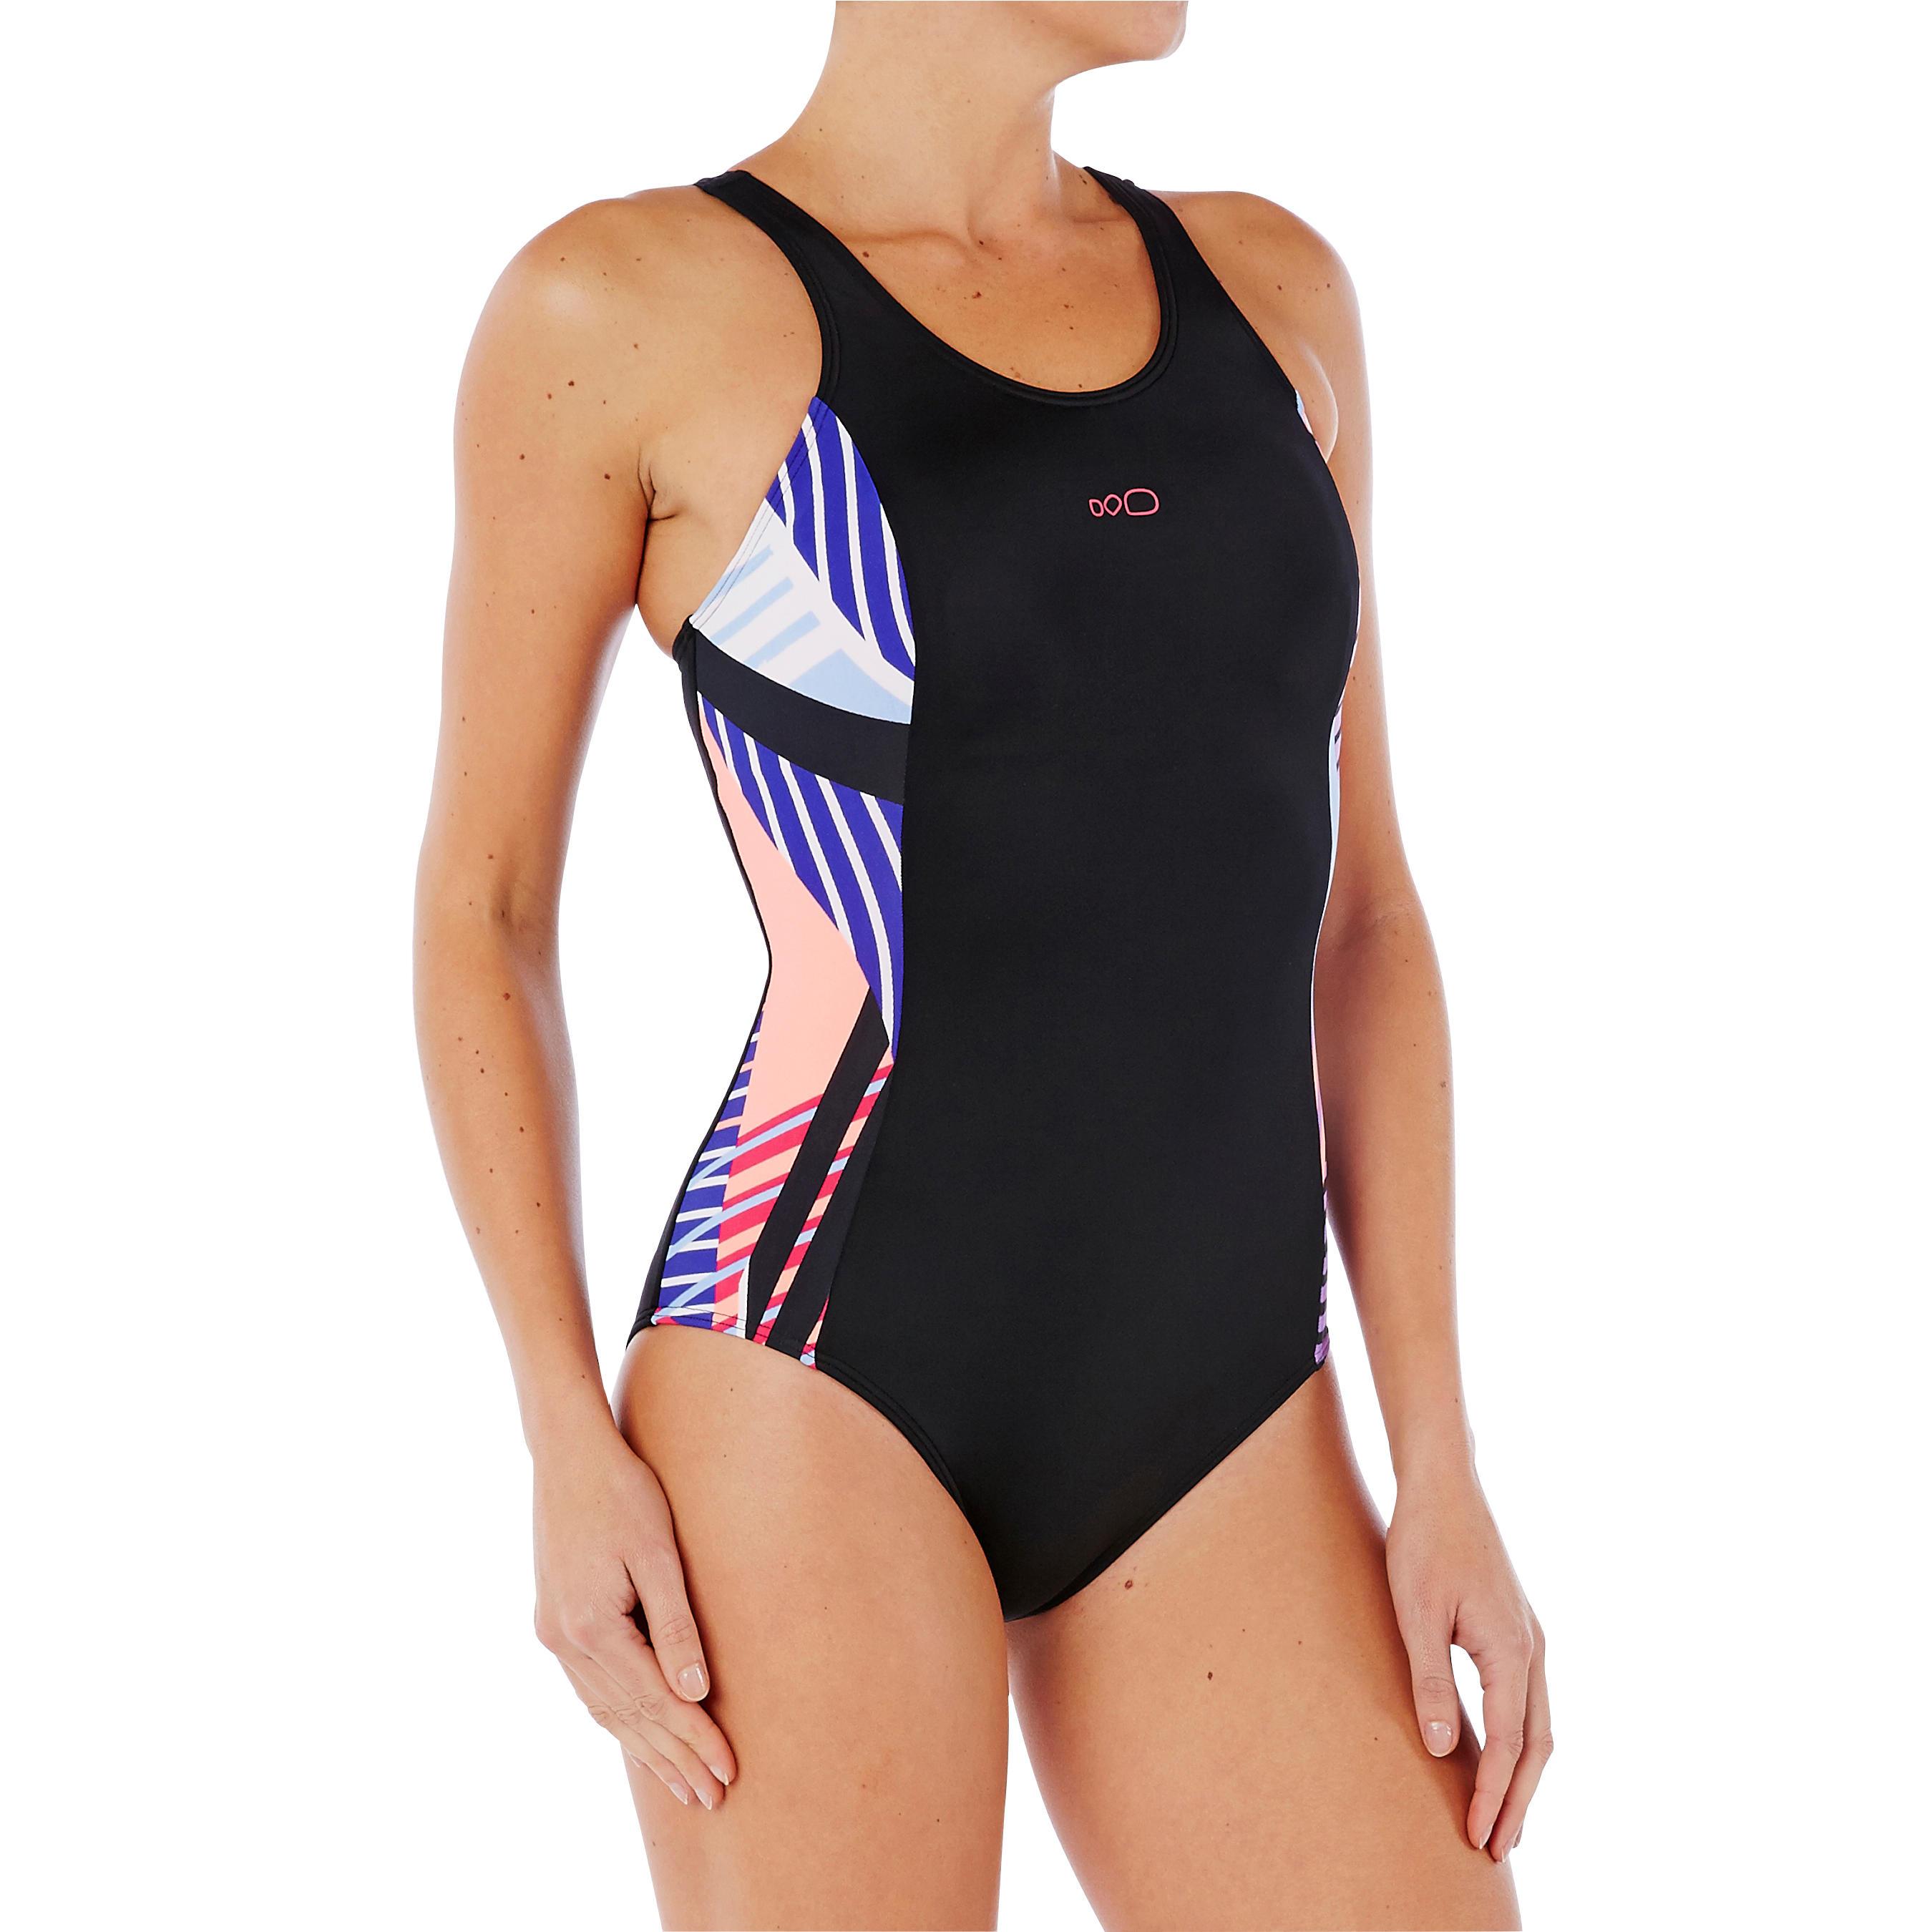 Vega Women's One-Piece Swimsuit - Black